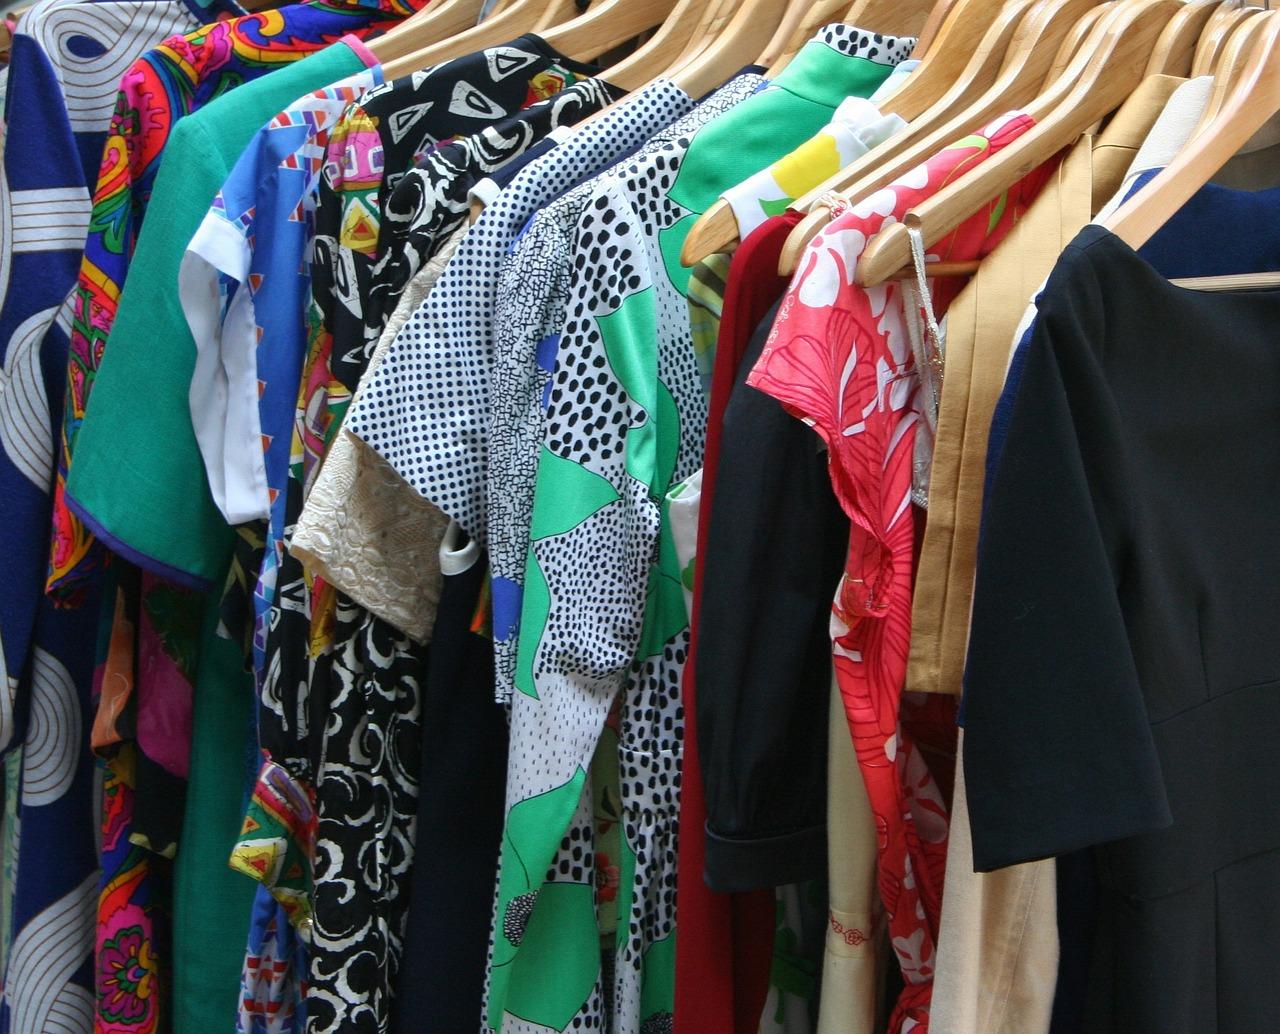 dresses-53319_1280.jpg